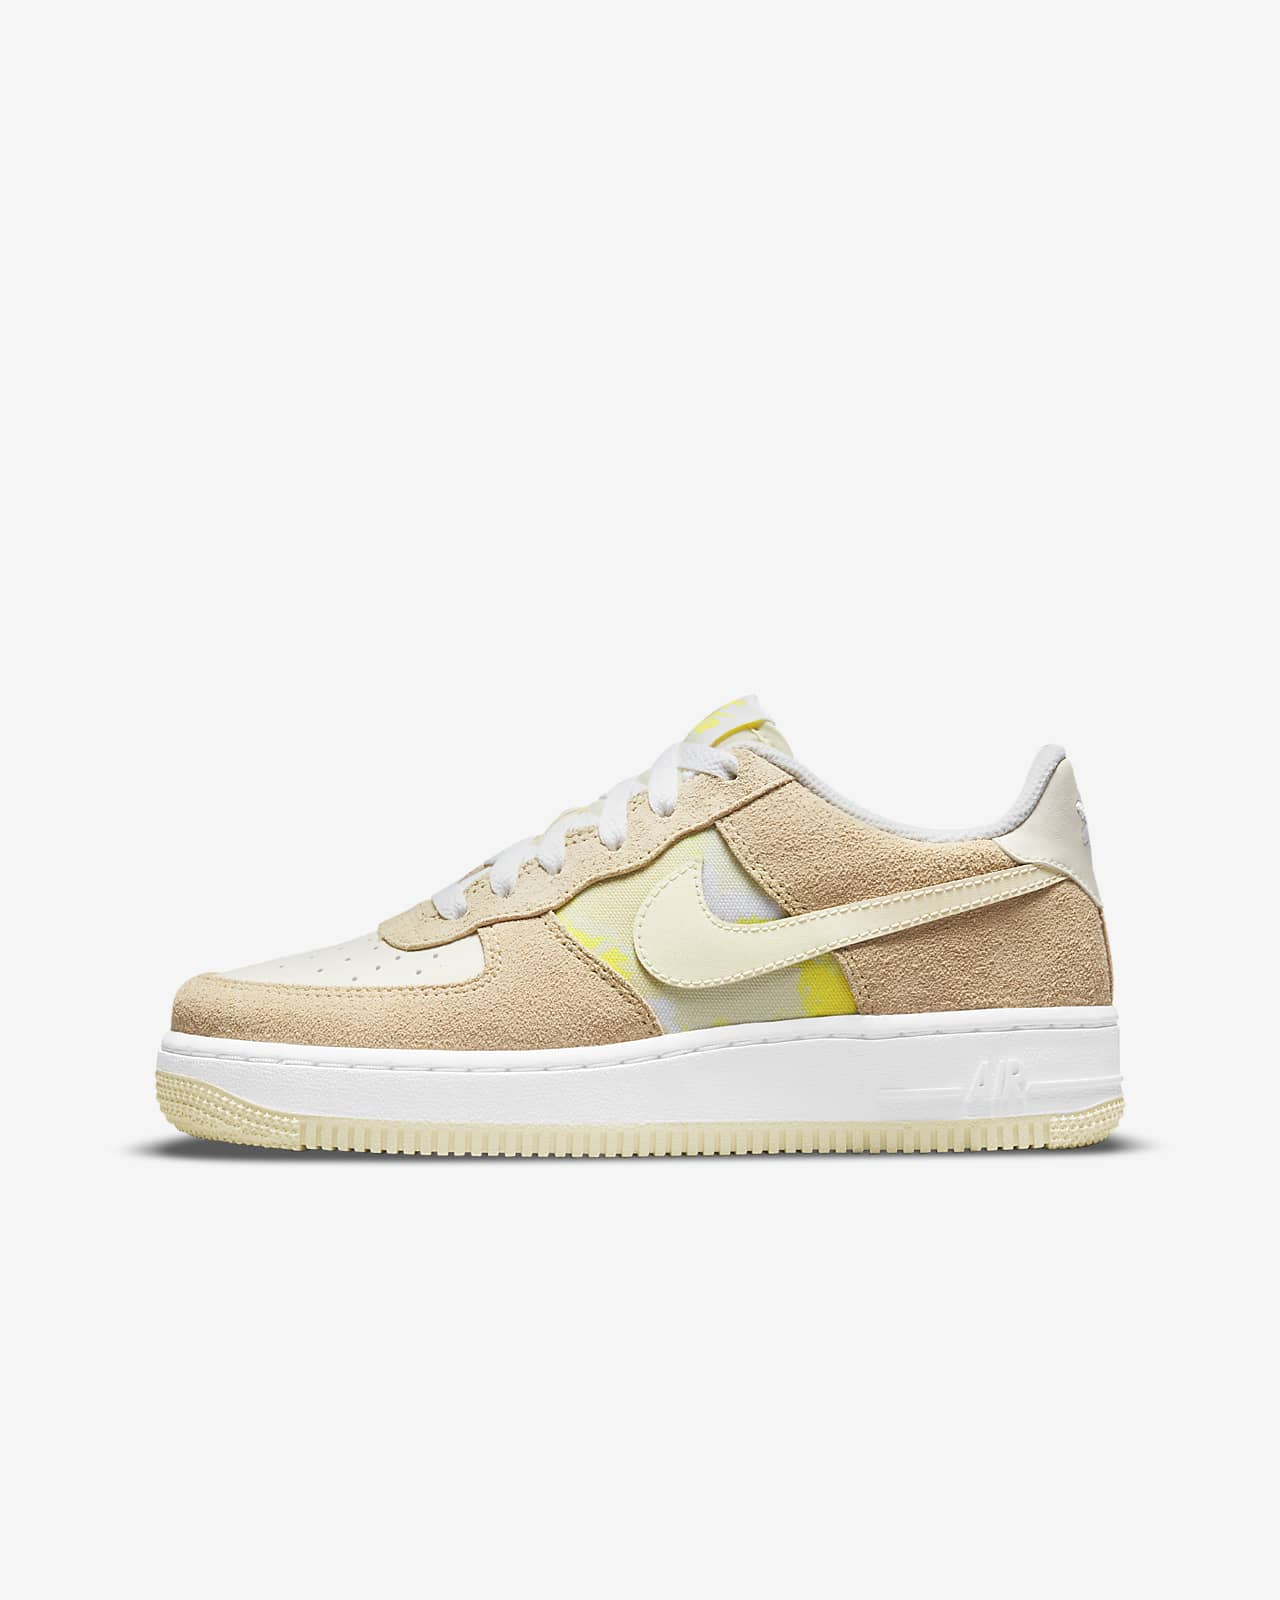 Sapatilhas Nike Air Force 1 Low Júnior